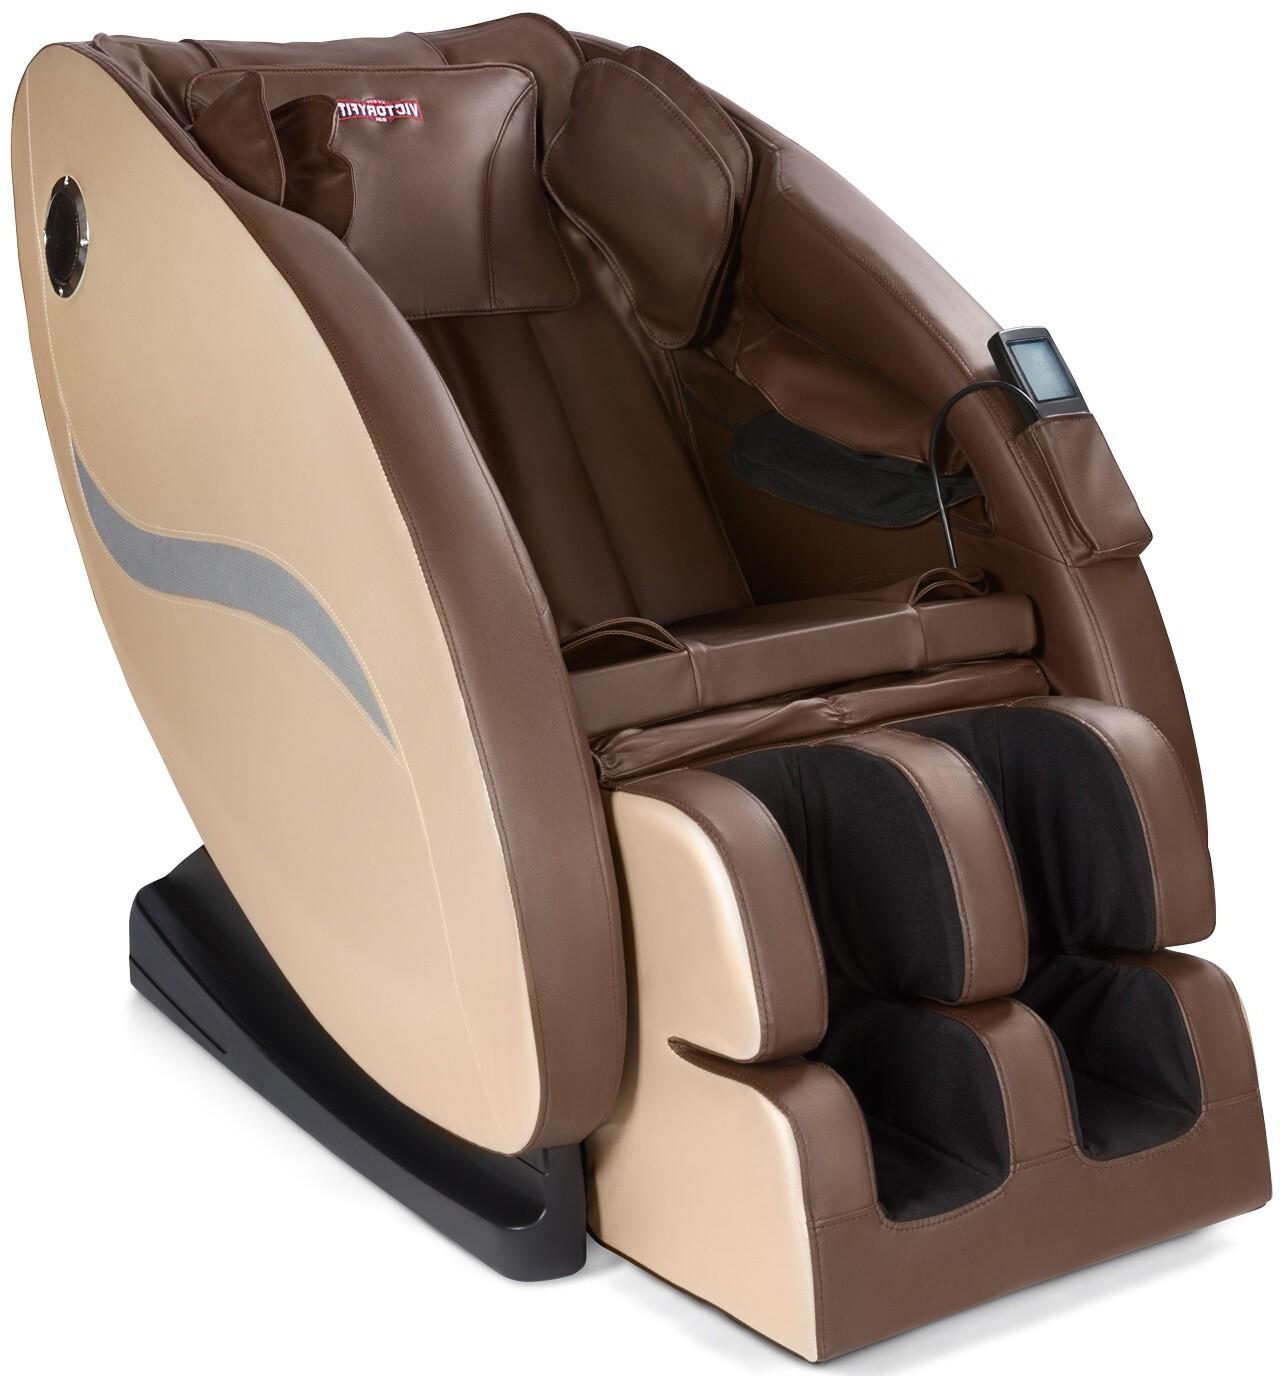 Массажное кресло VictoryFit VF-M99 Brown/Beige